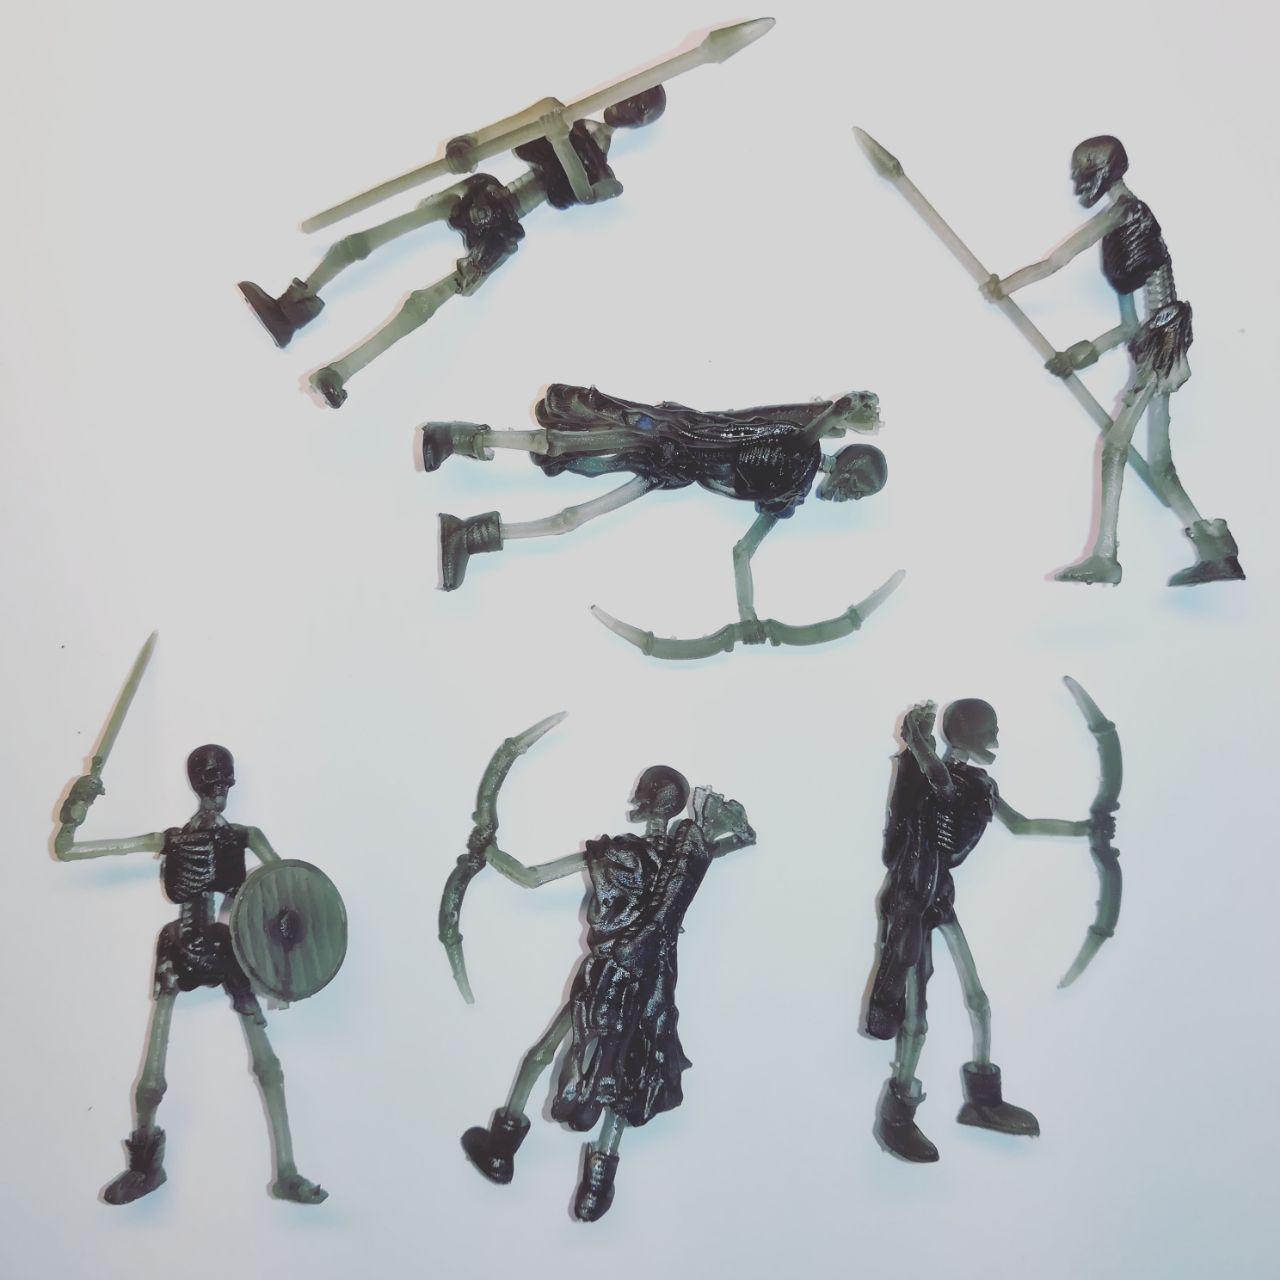 photo_2020-10-14_09-30-36.jpg Download STL file Sekeltons - 28mm D&D Miniatures  • 3D printing template, pyrokahd